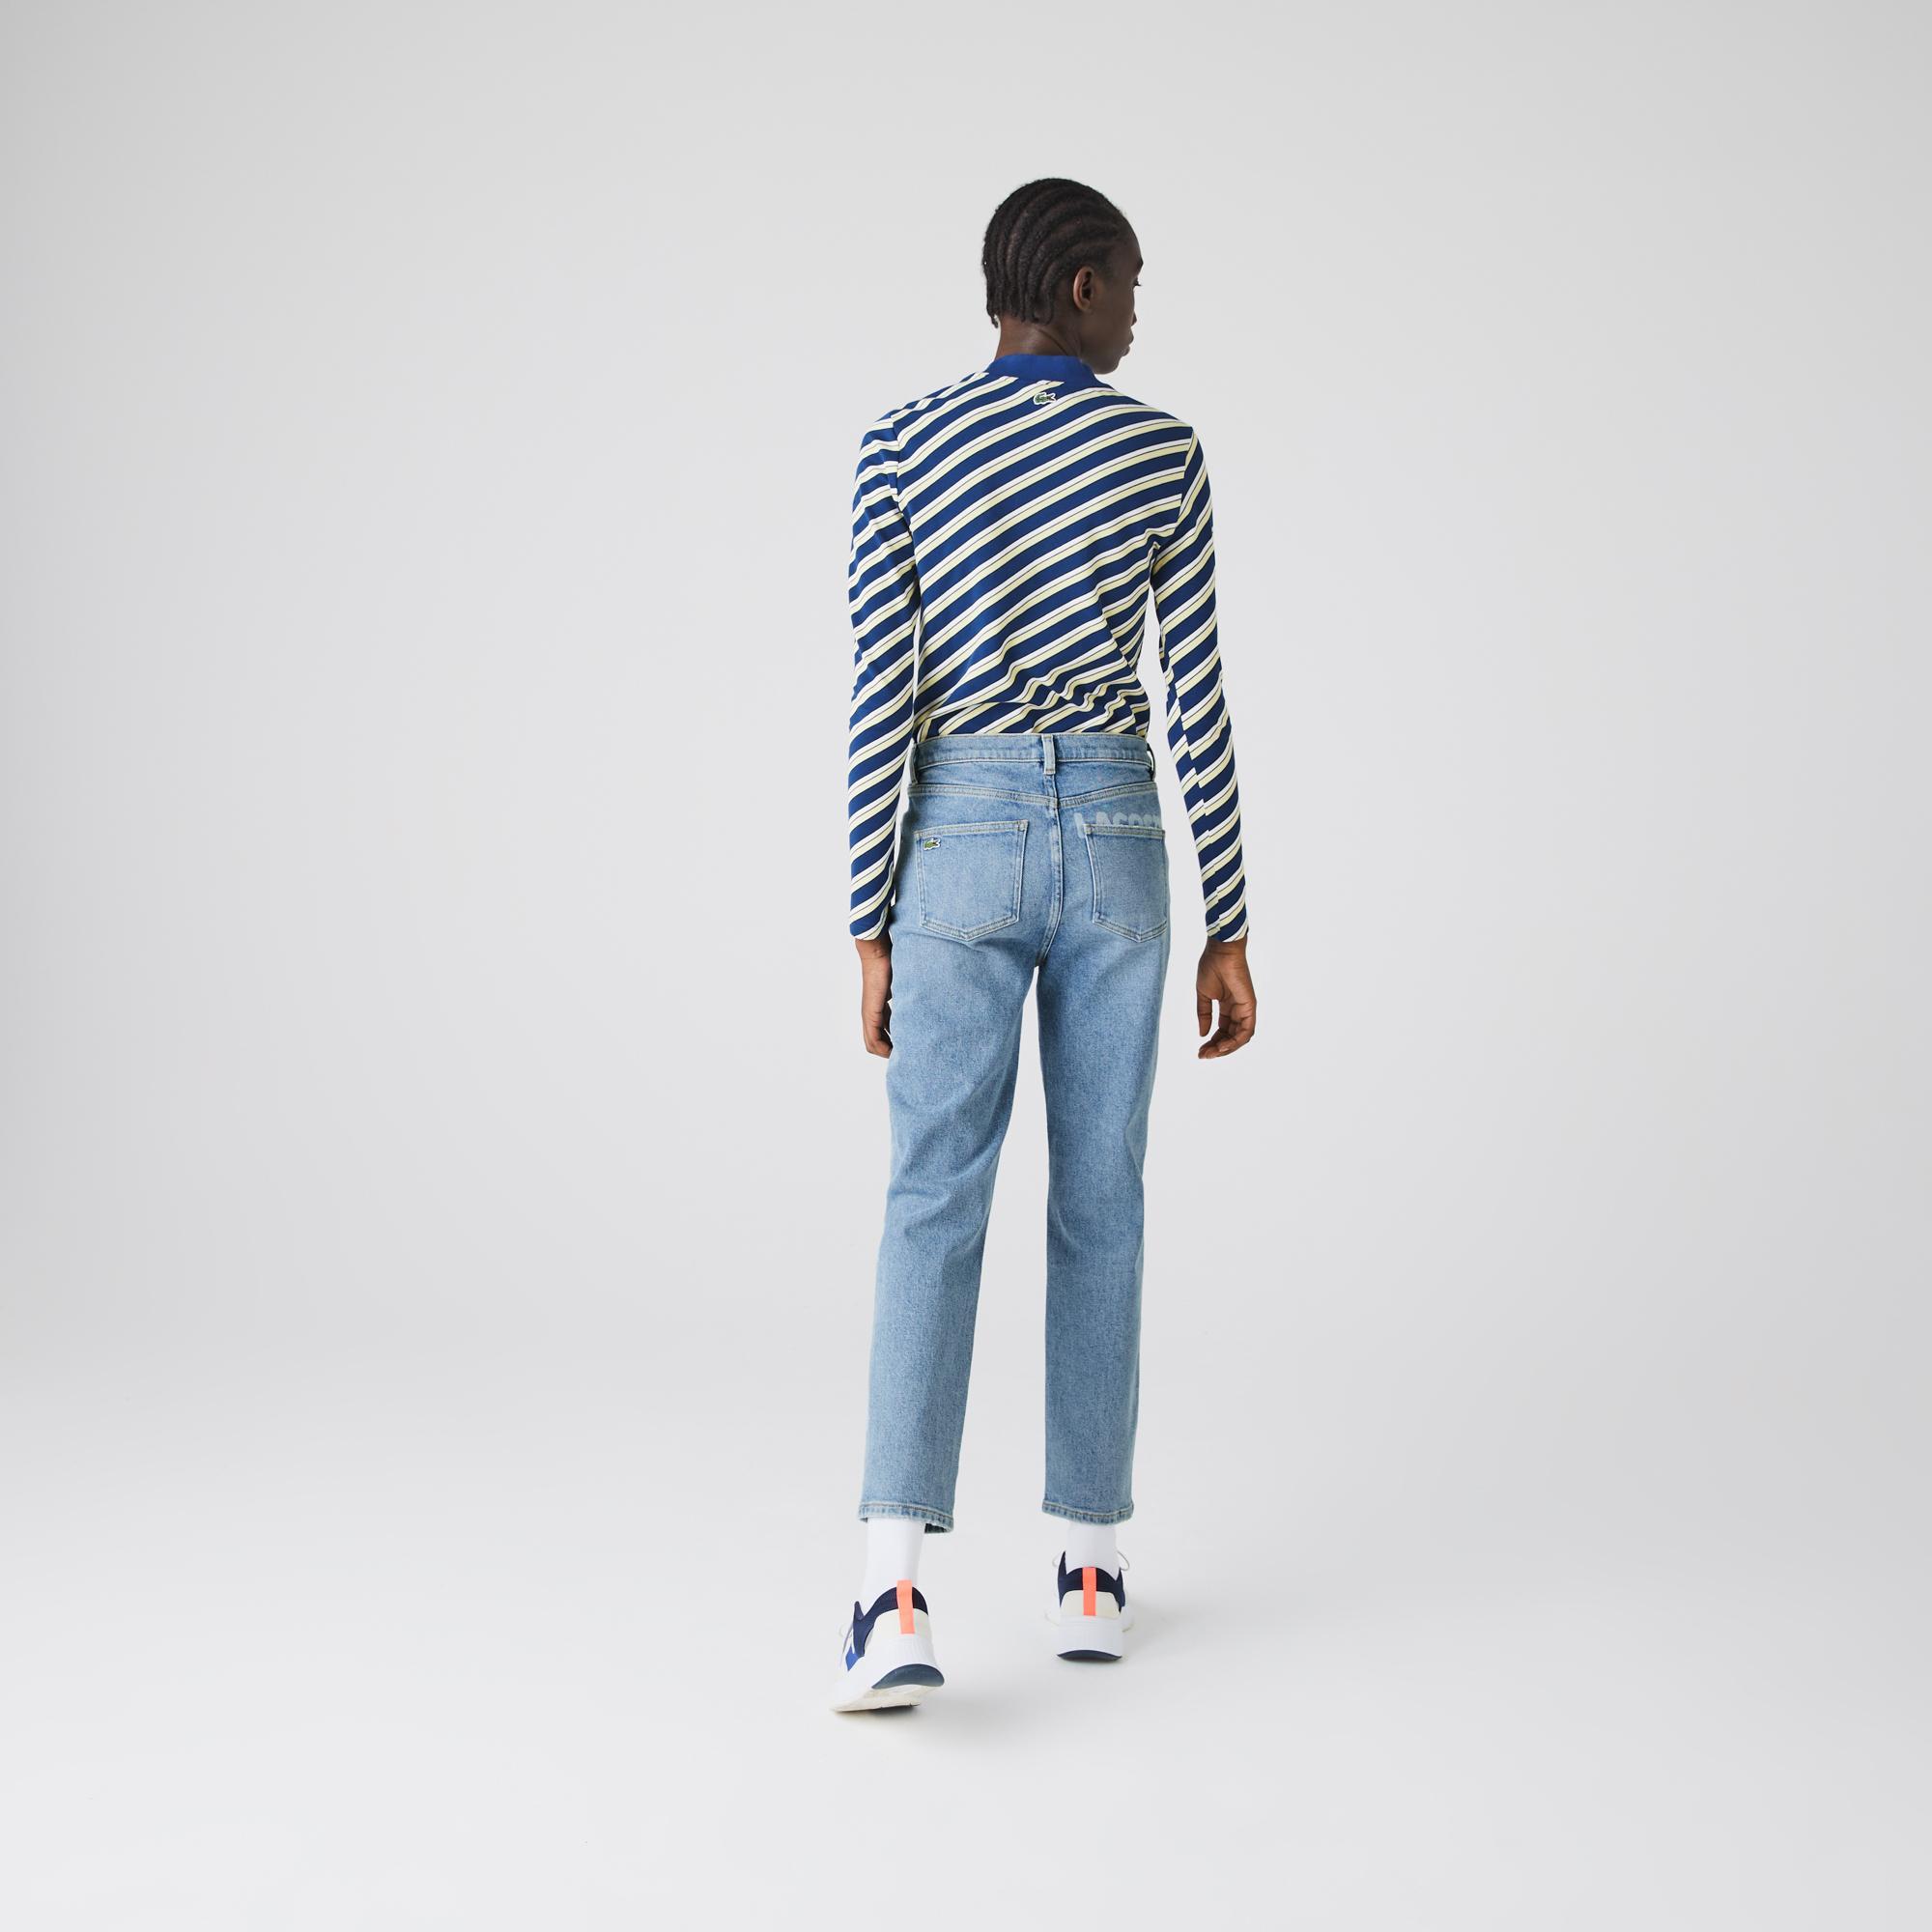 Lacoste L!VE Kadın Slim Fit Denim Pantolon